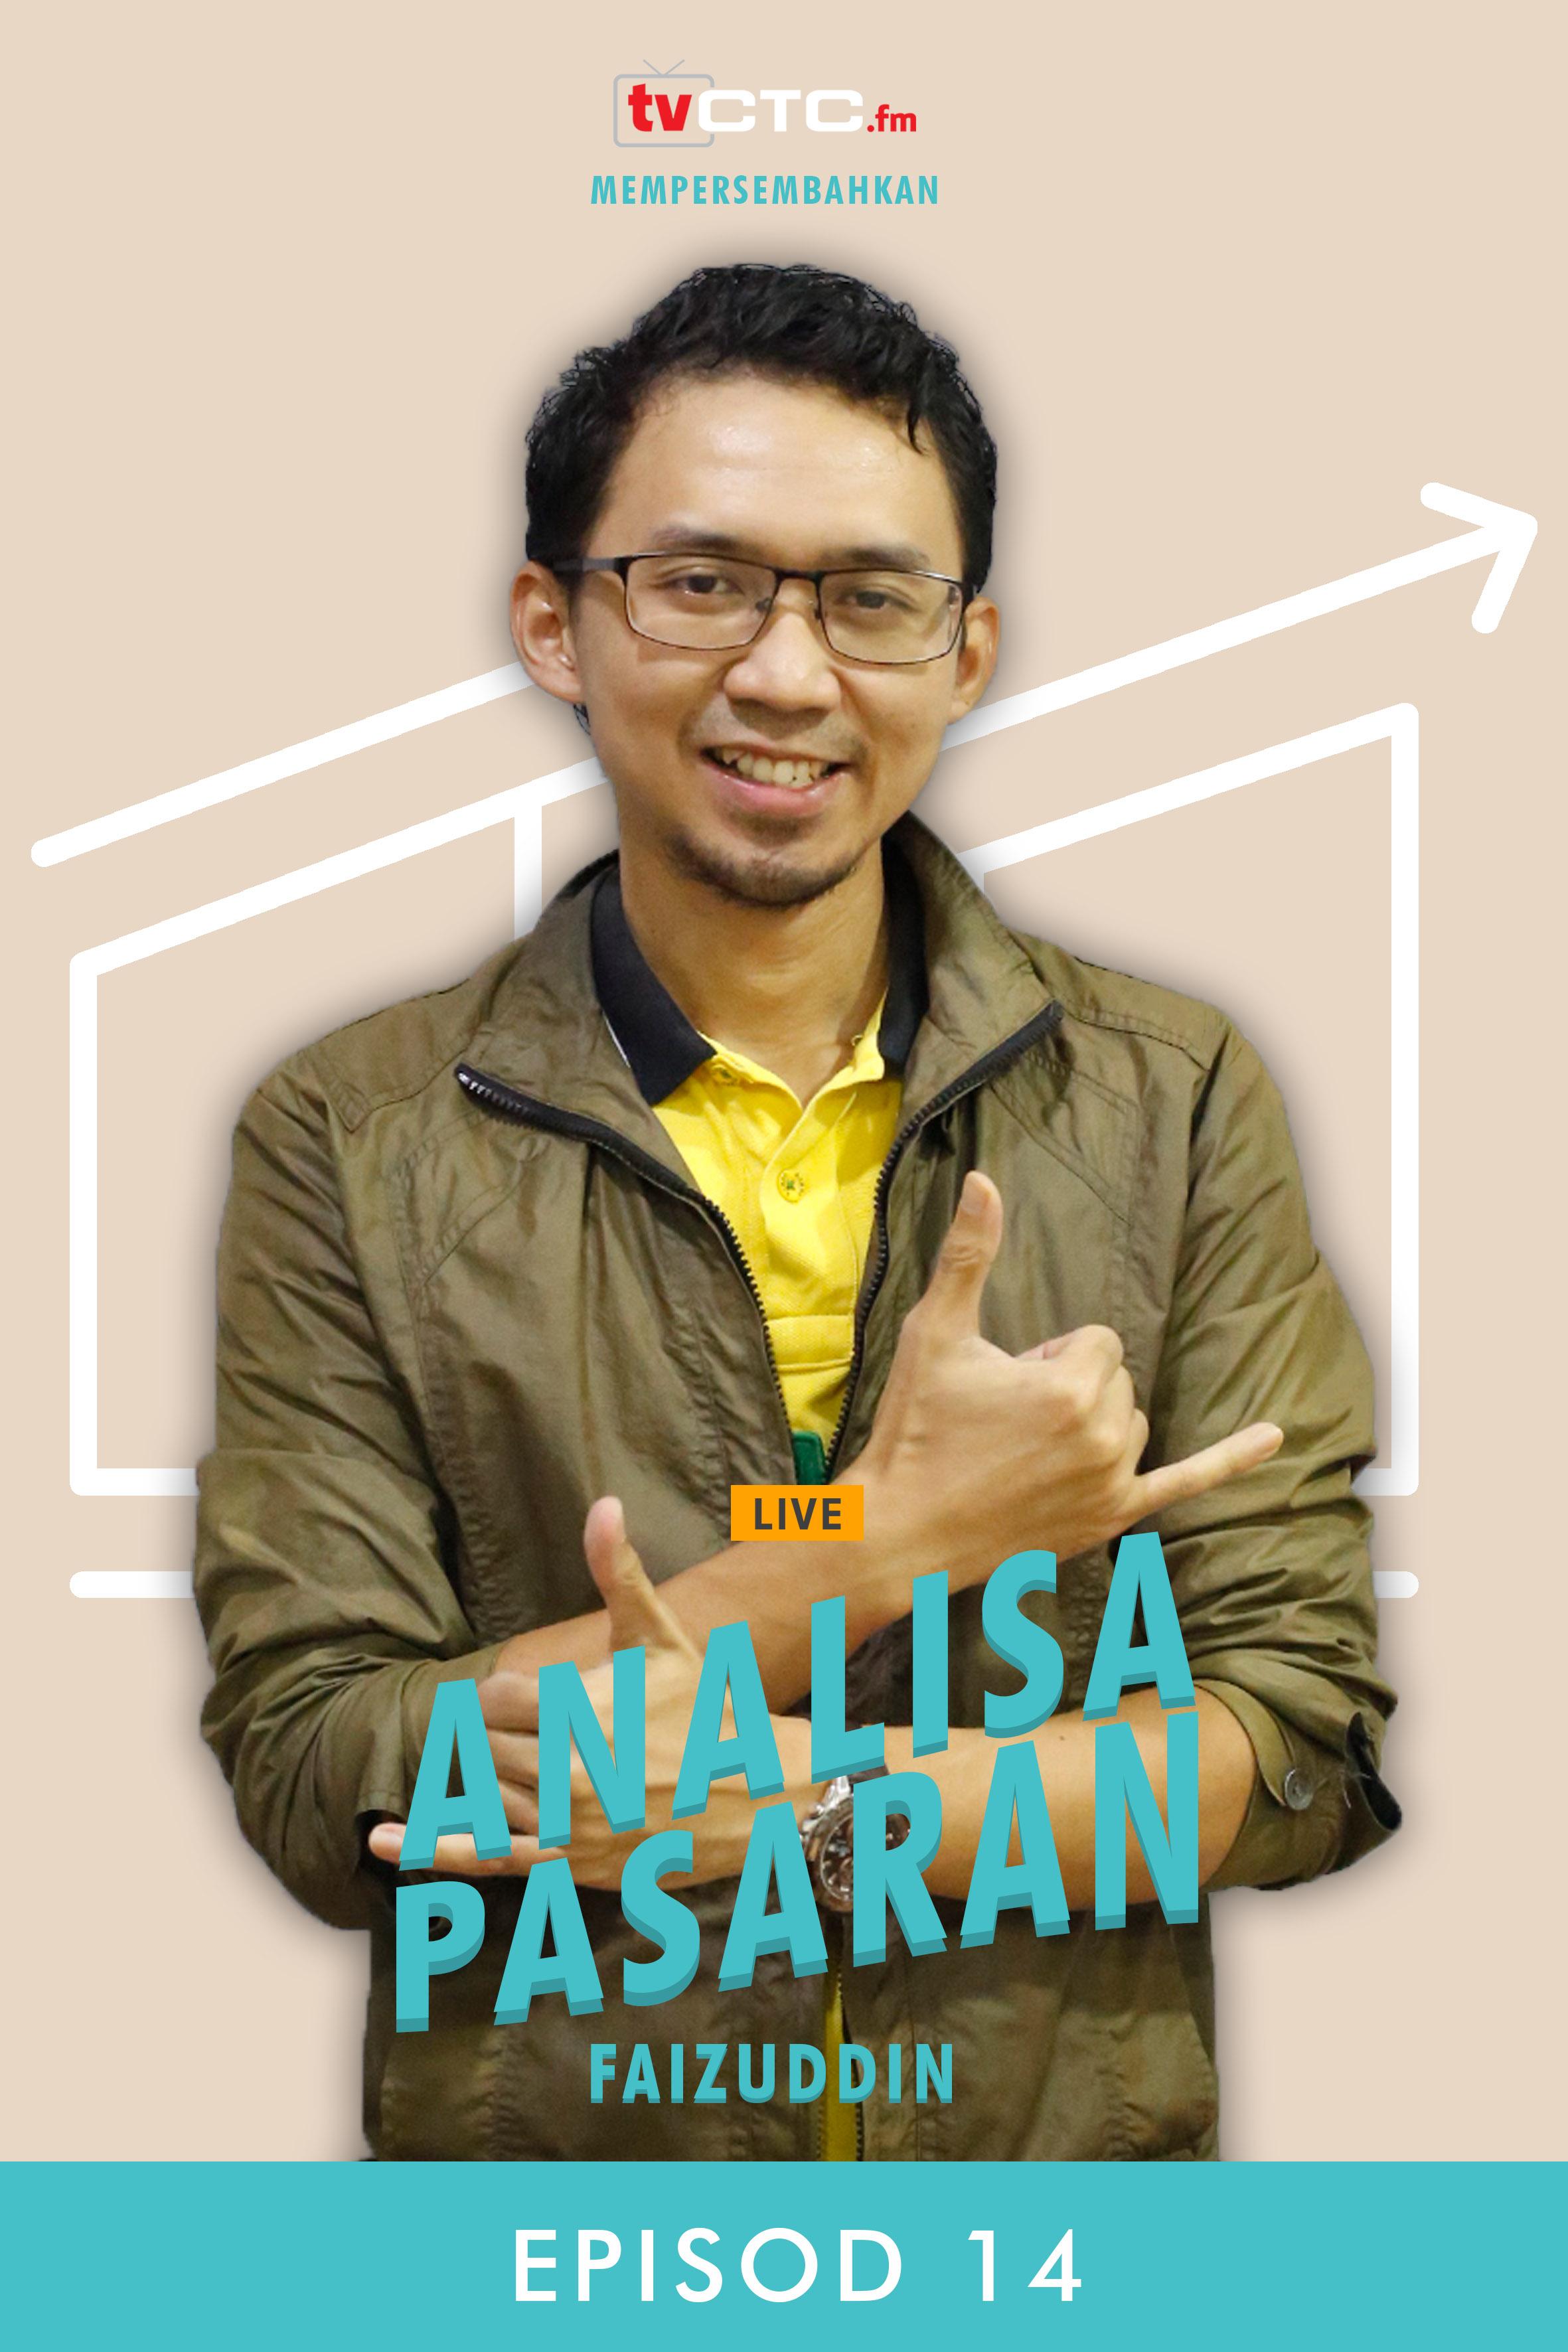 ANALISA PASARAN : Faizuddin (Episod 14)